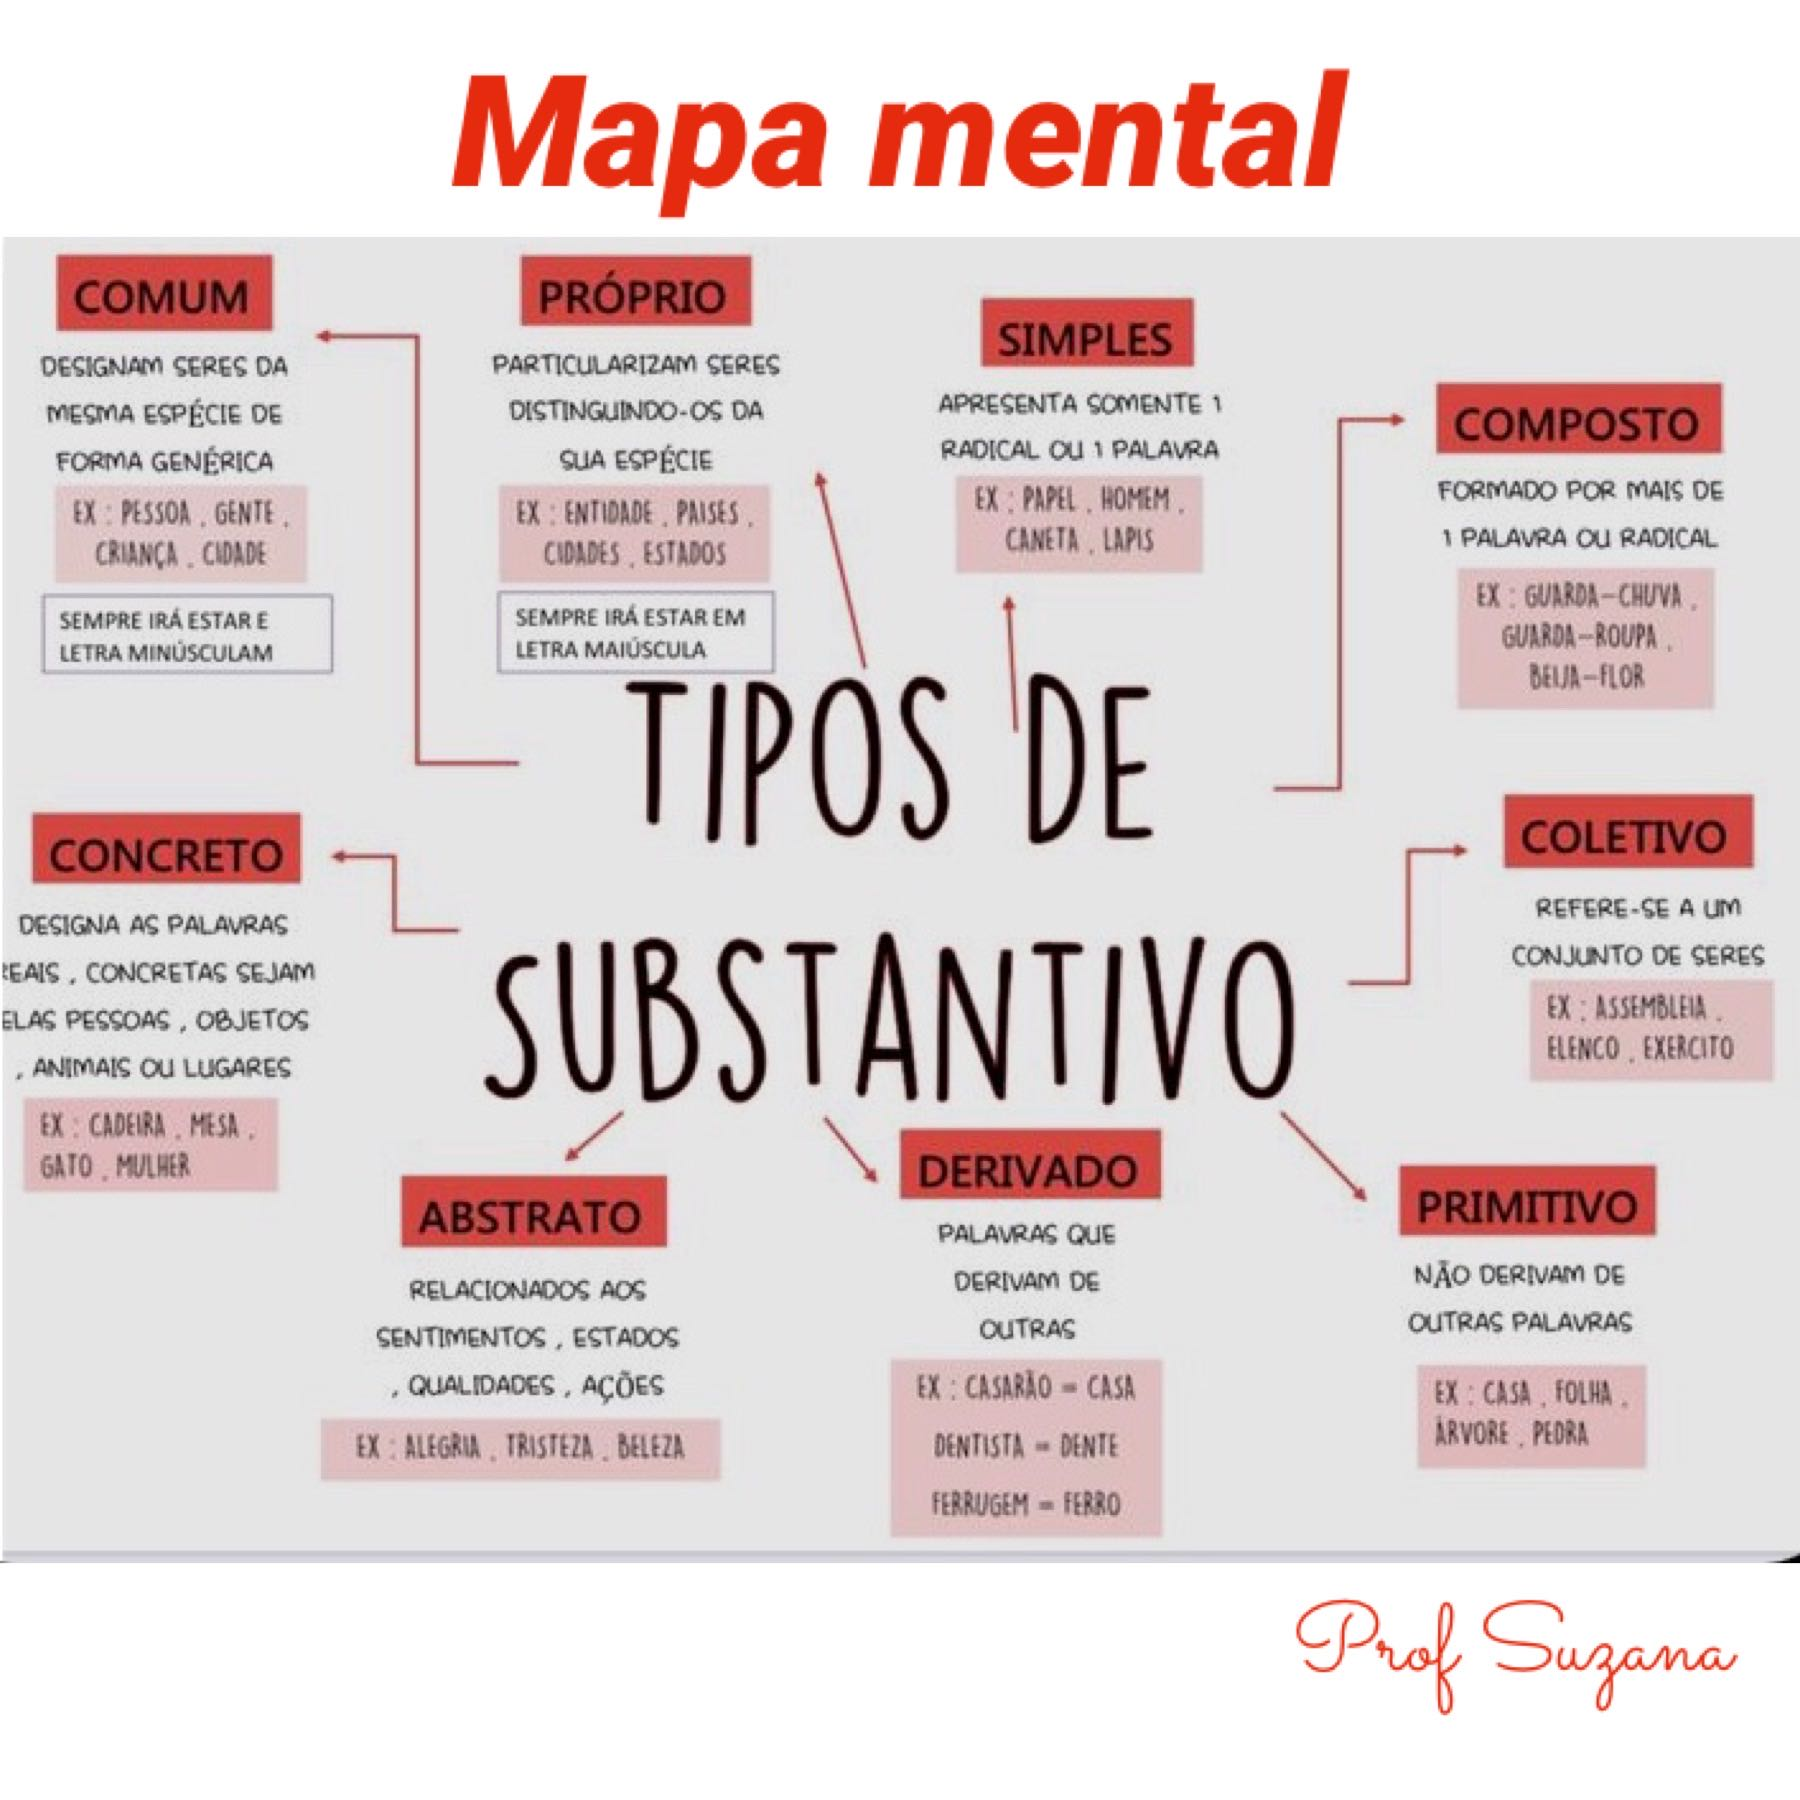 Mapa mental dos tipos de substantivos